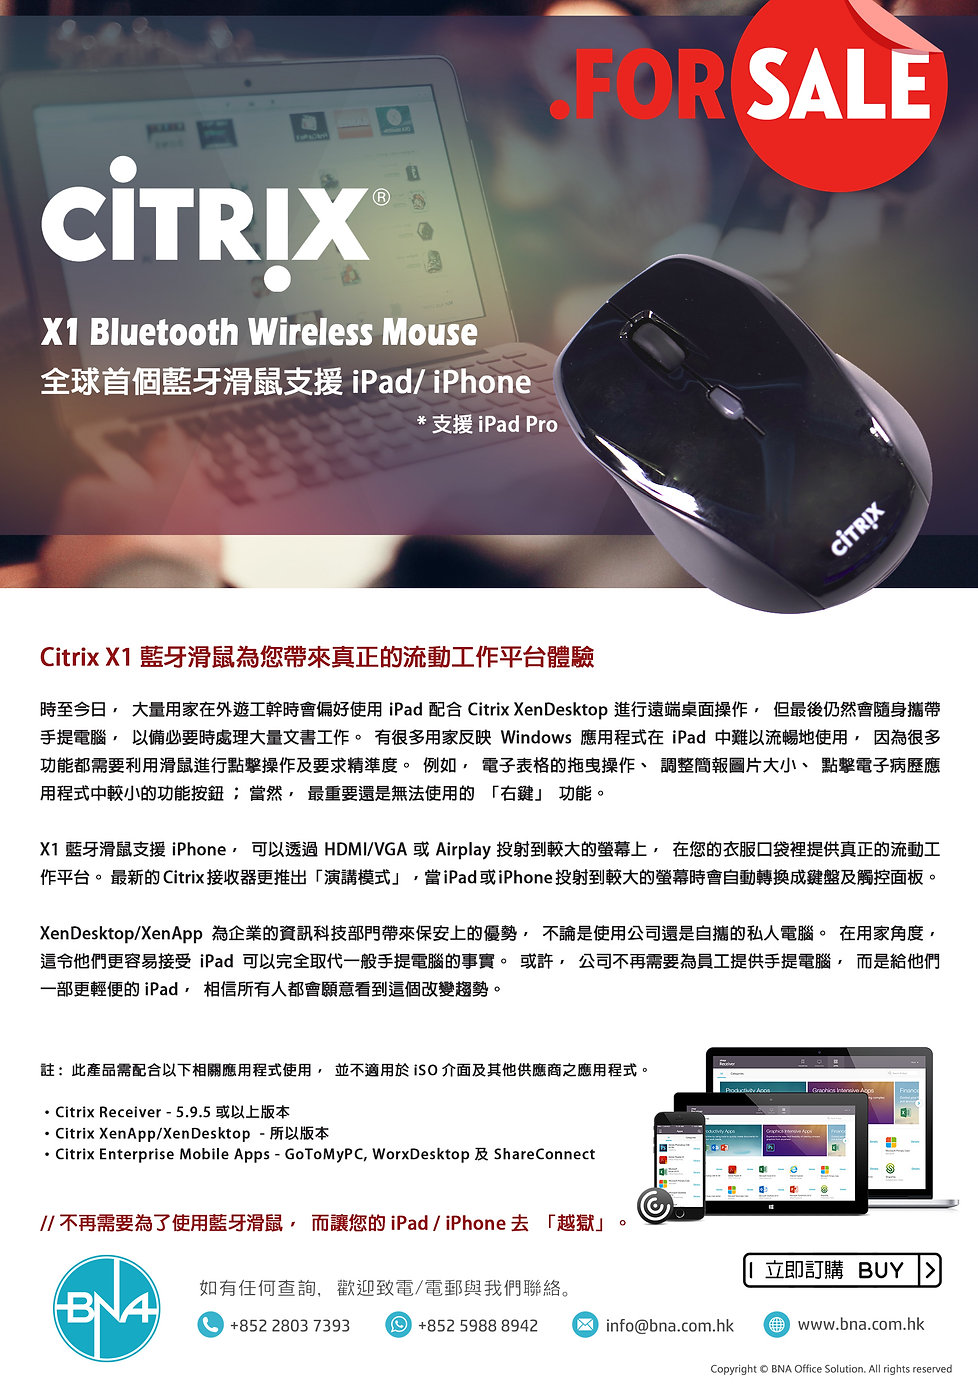 CITRIX X1.jpg